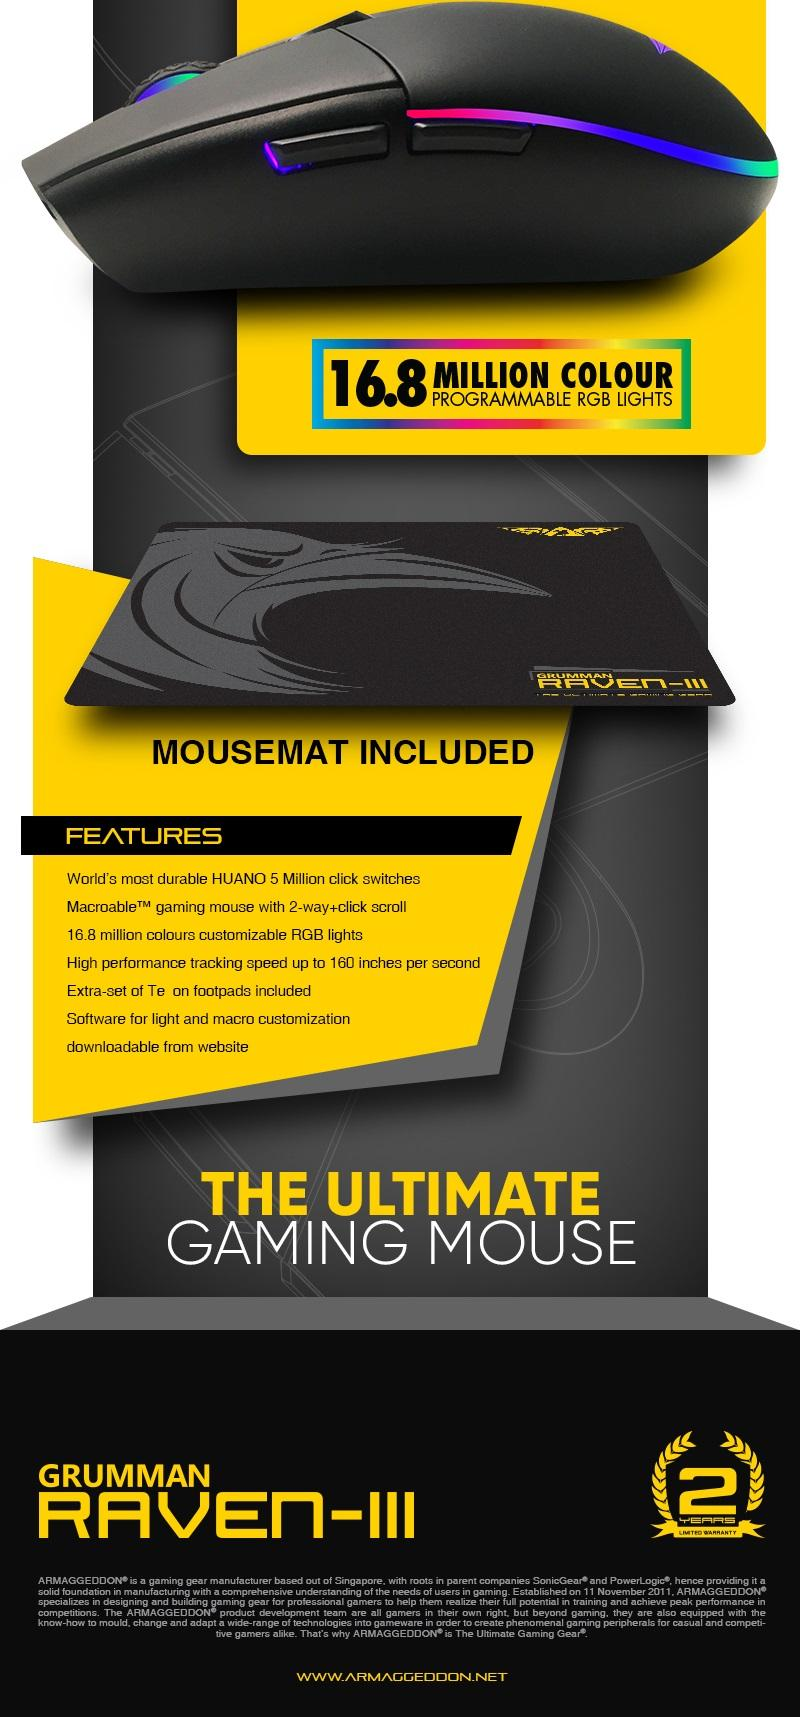 Armaggeddon Gaming Bundle E Sports Pro Kitmouse Keyboard Mousemat Mka 3c Psychfalcon Edm Raven Iii 02